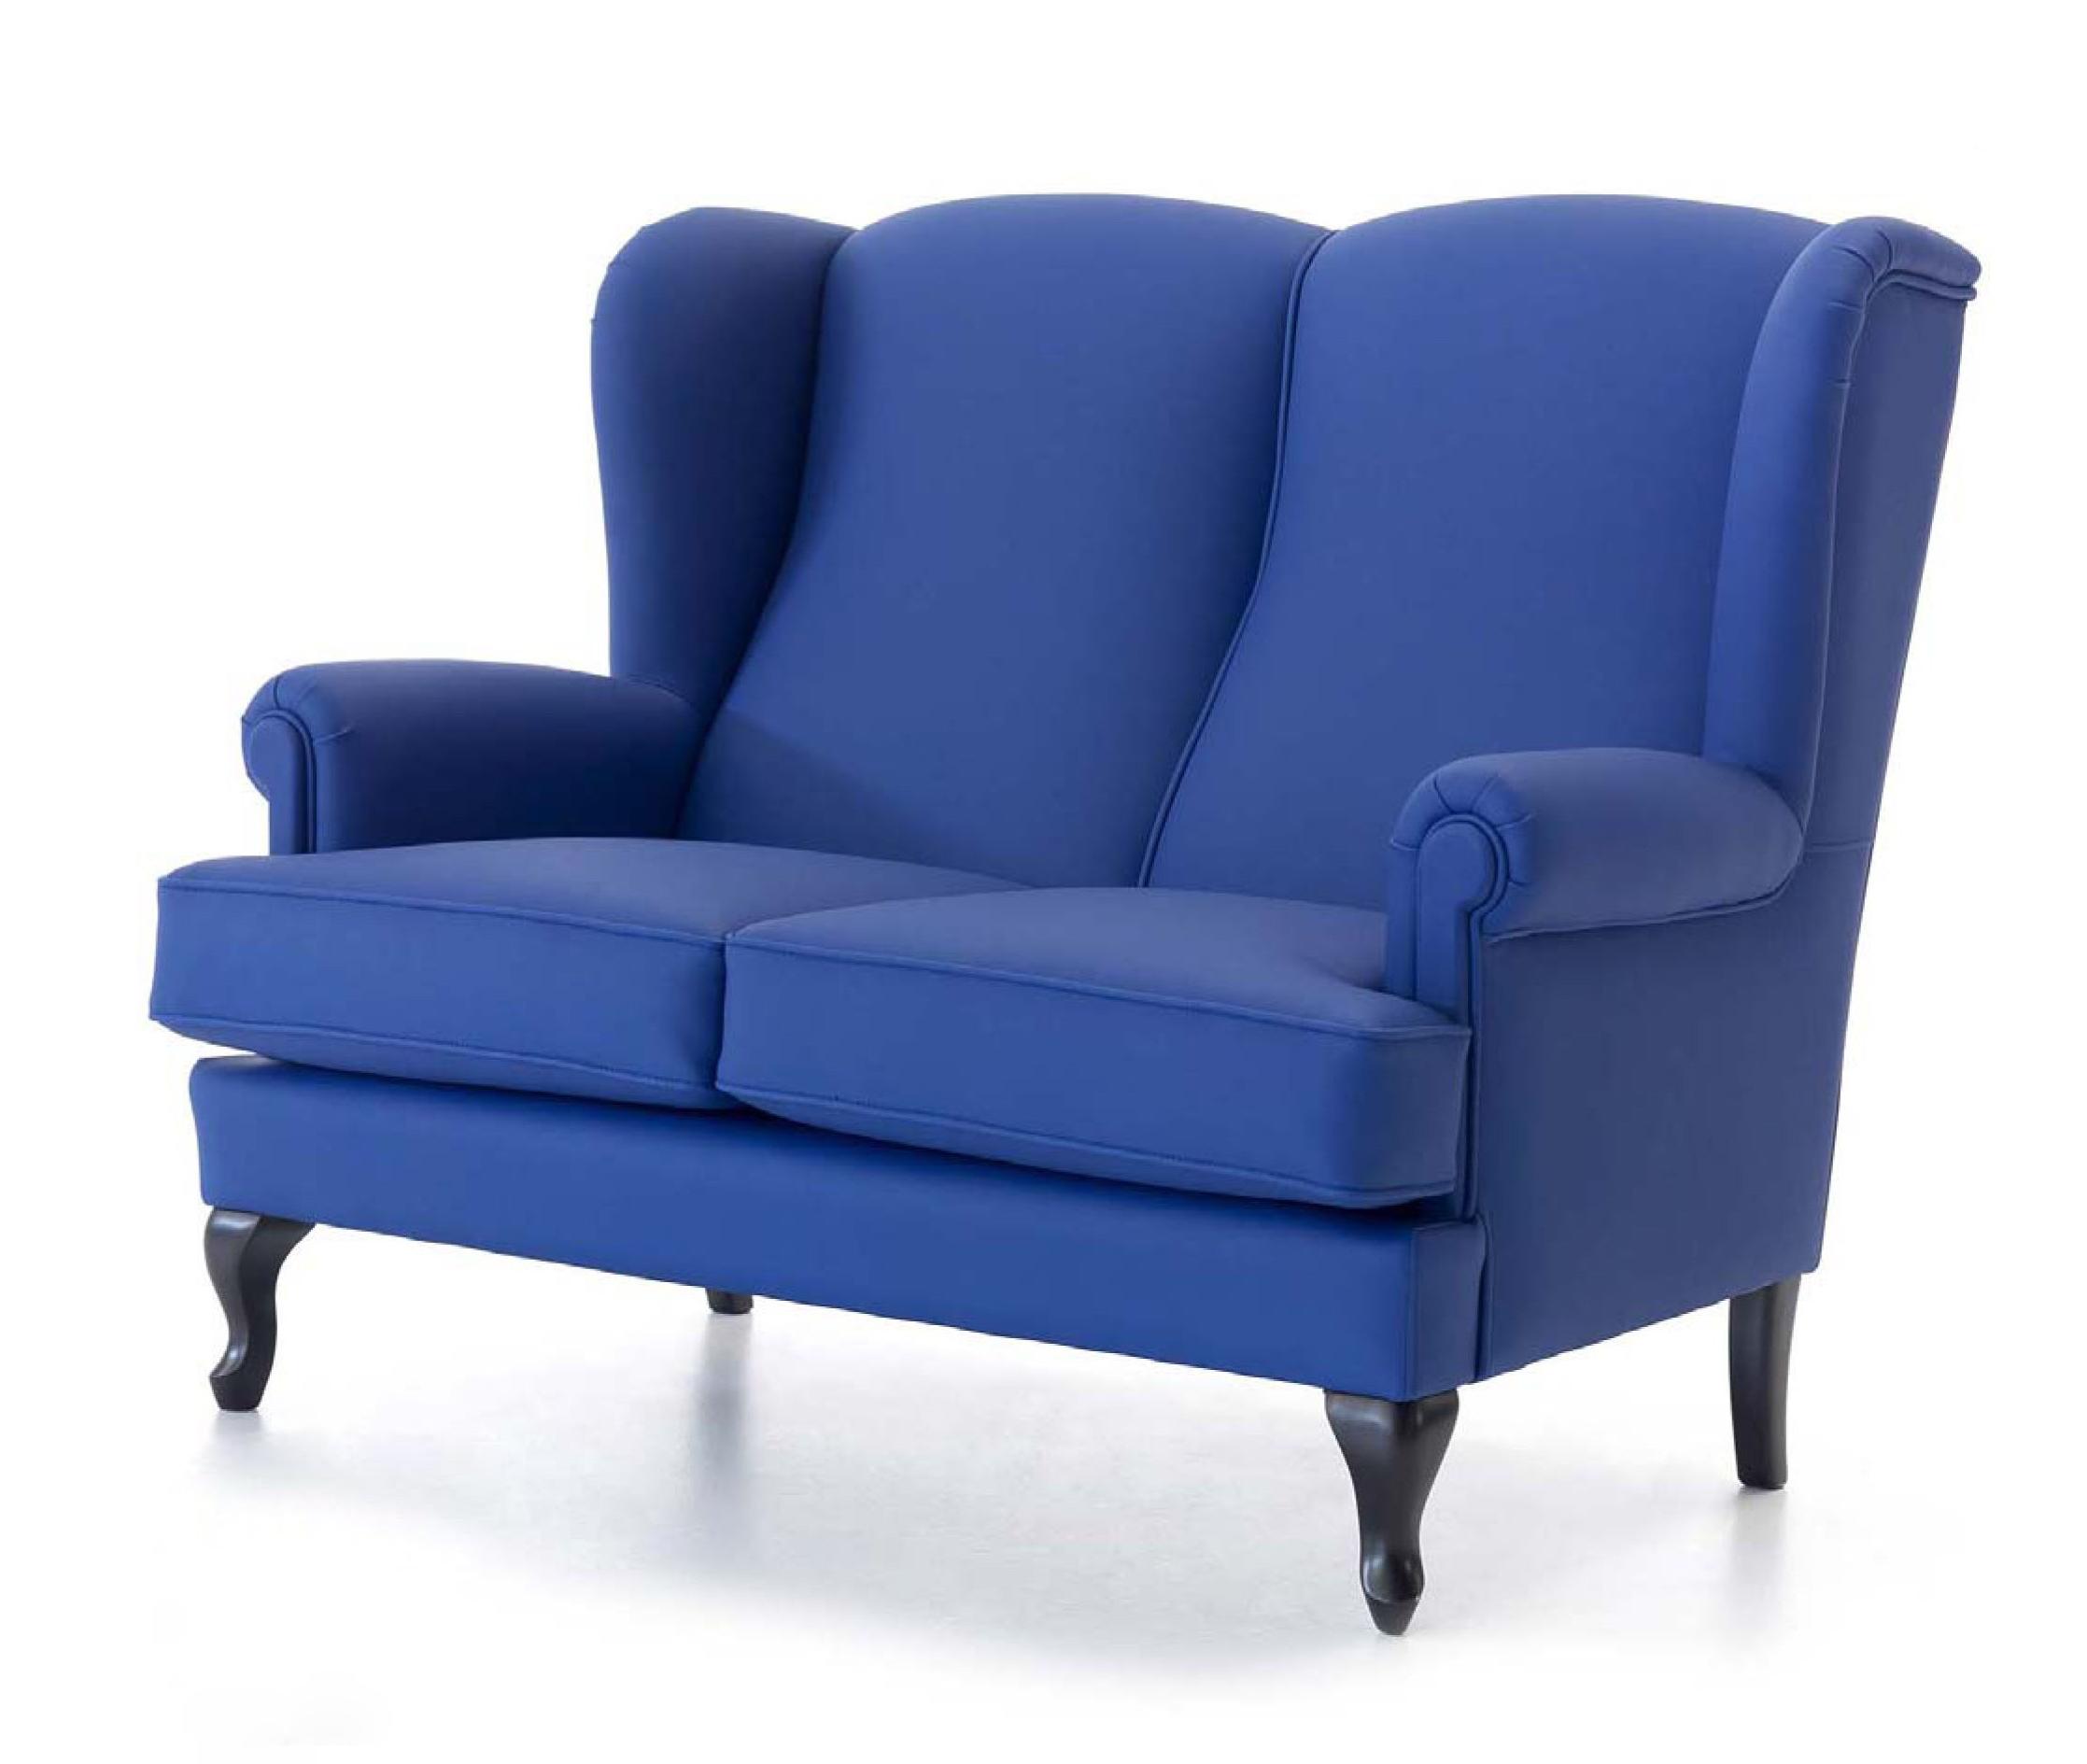 Sofa orejero X8d1 sofa orejero Dos Plazas Sillon Geriatrico Mobiliario Geriatrico